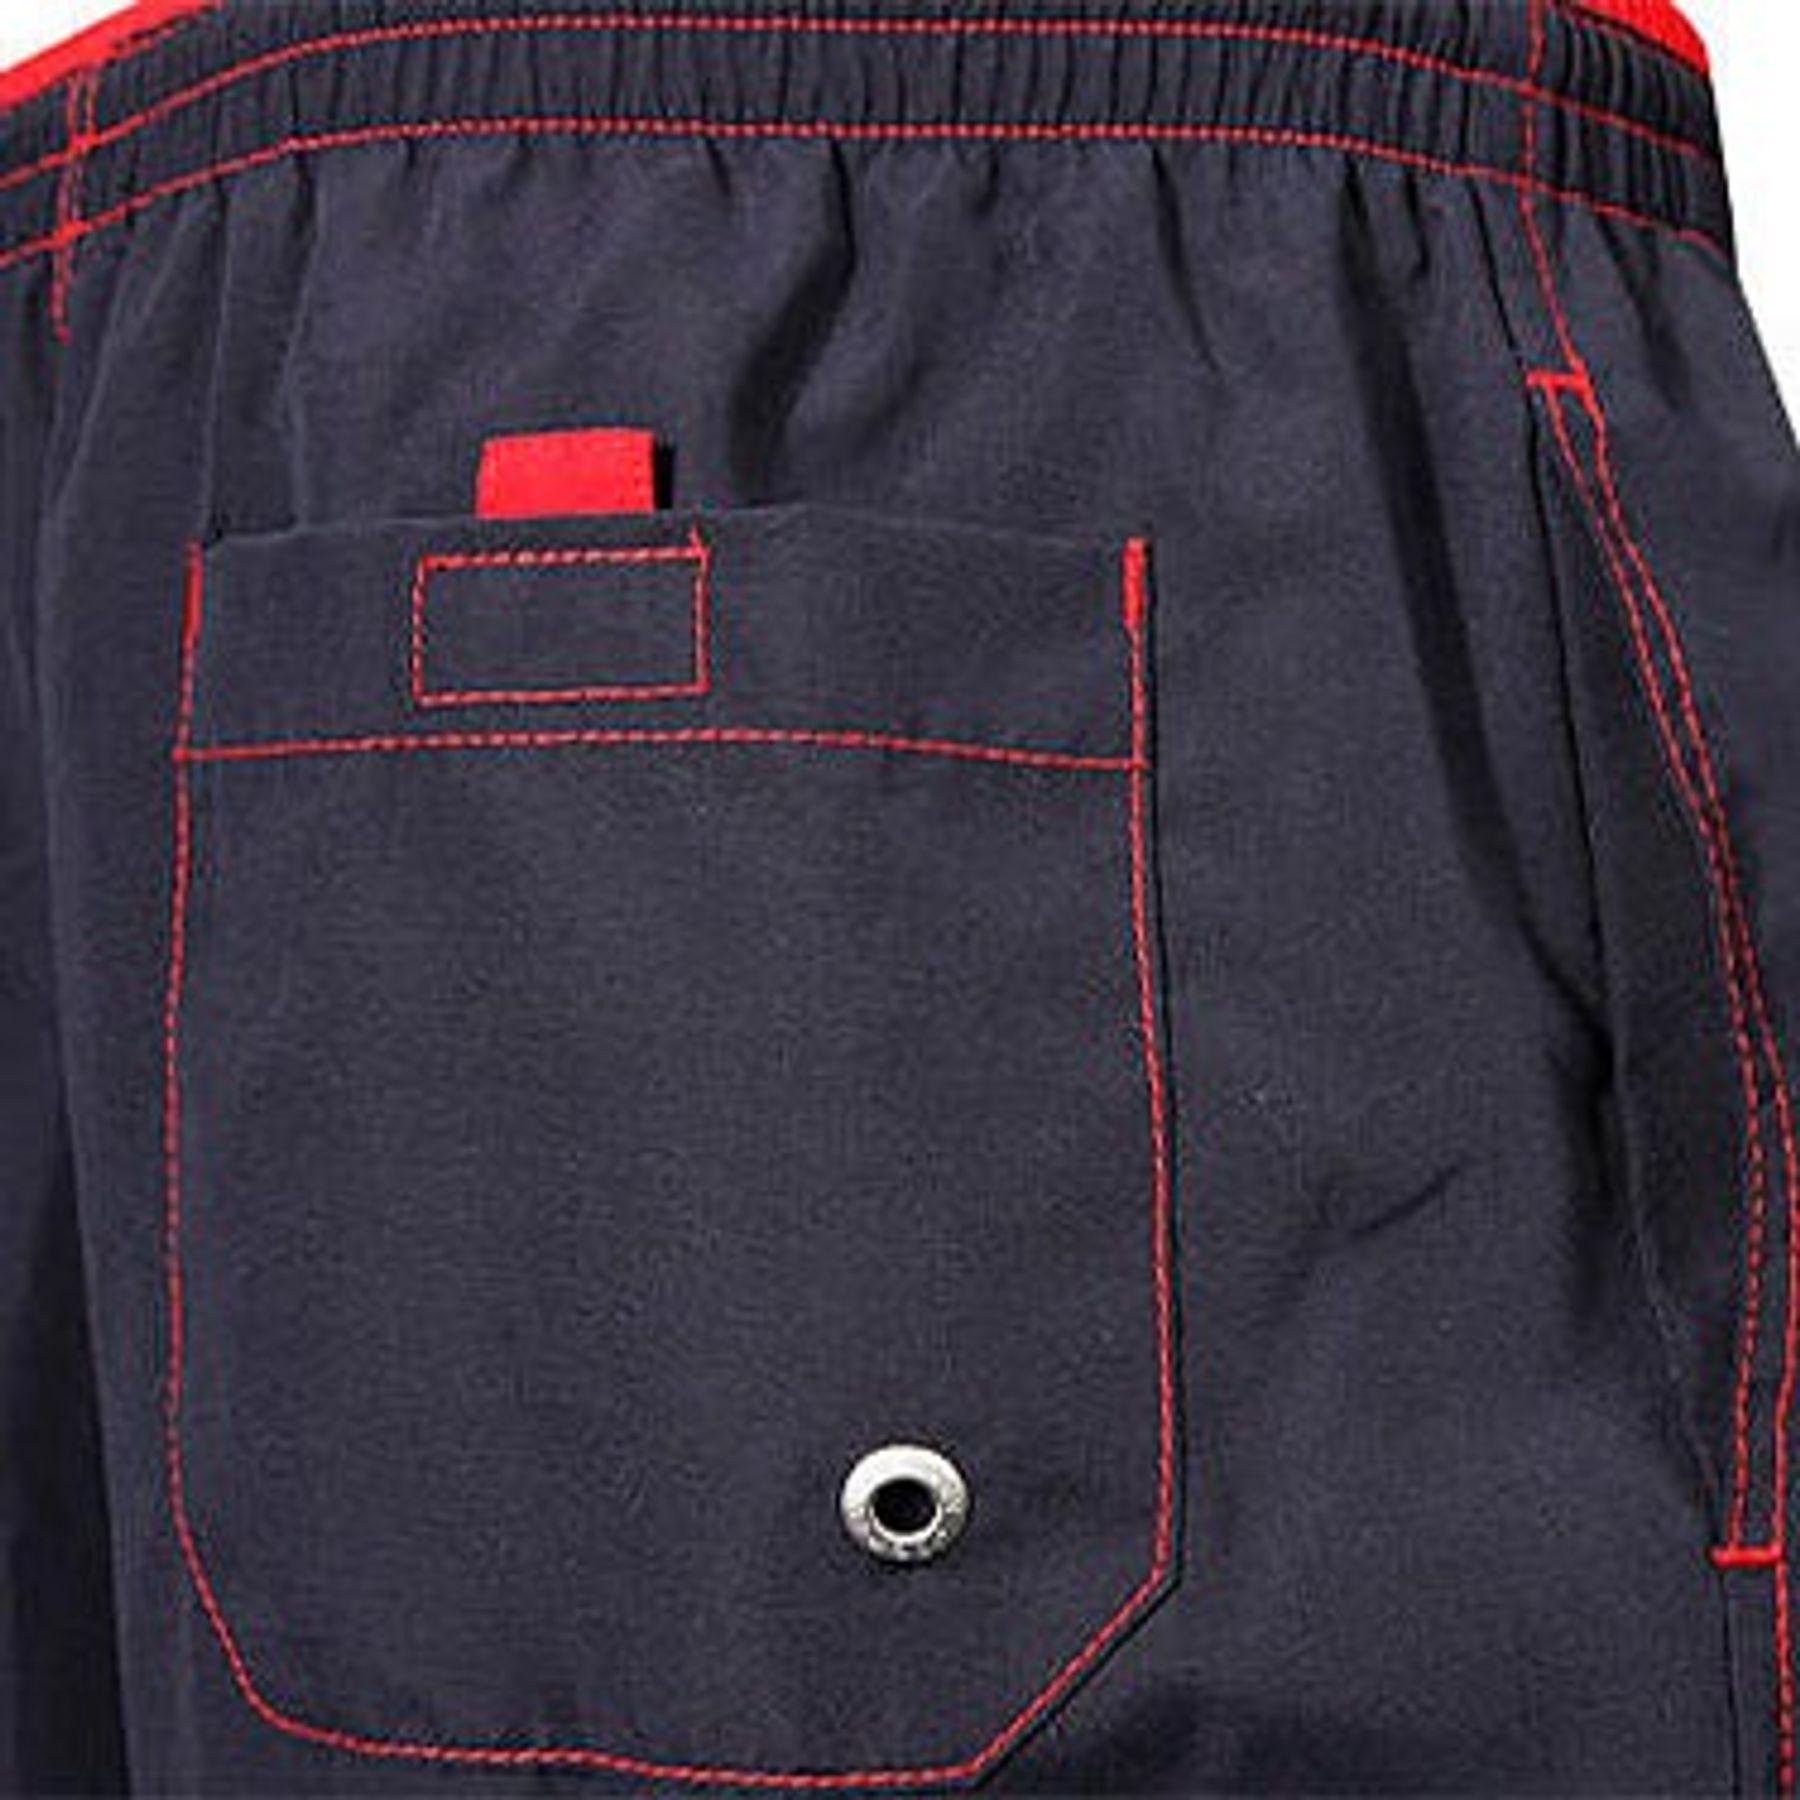 Jockey - Herren Long-Short USA Originals, Beachwear (60013) in 3 Farben – Bild 2